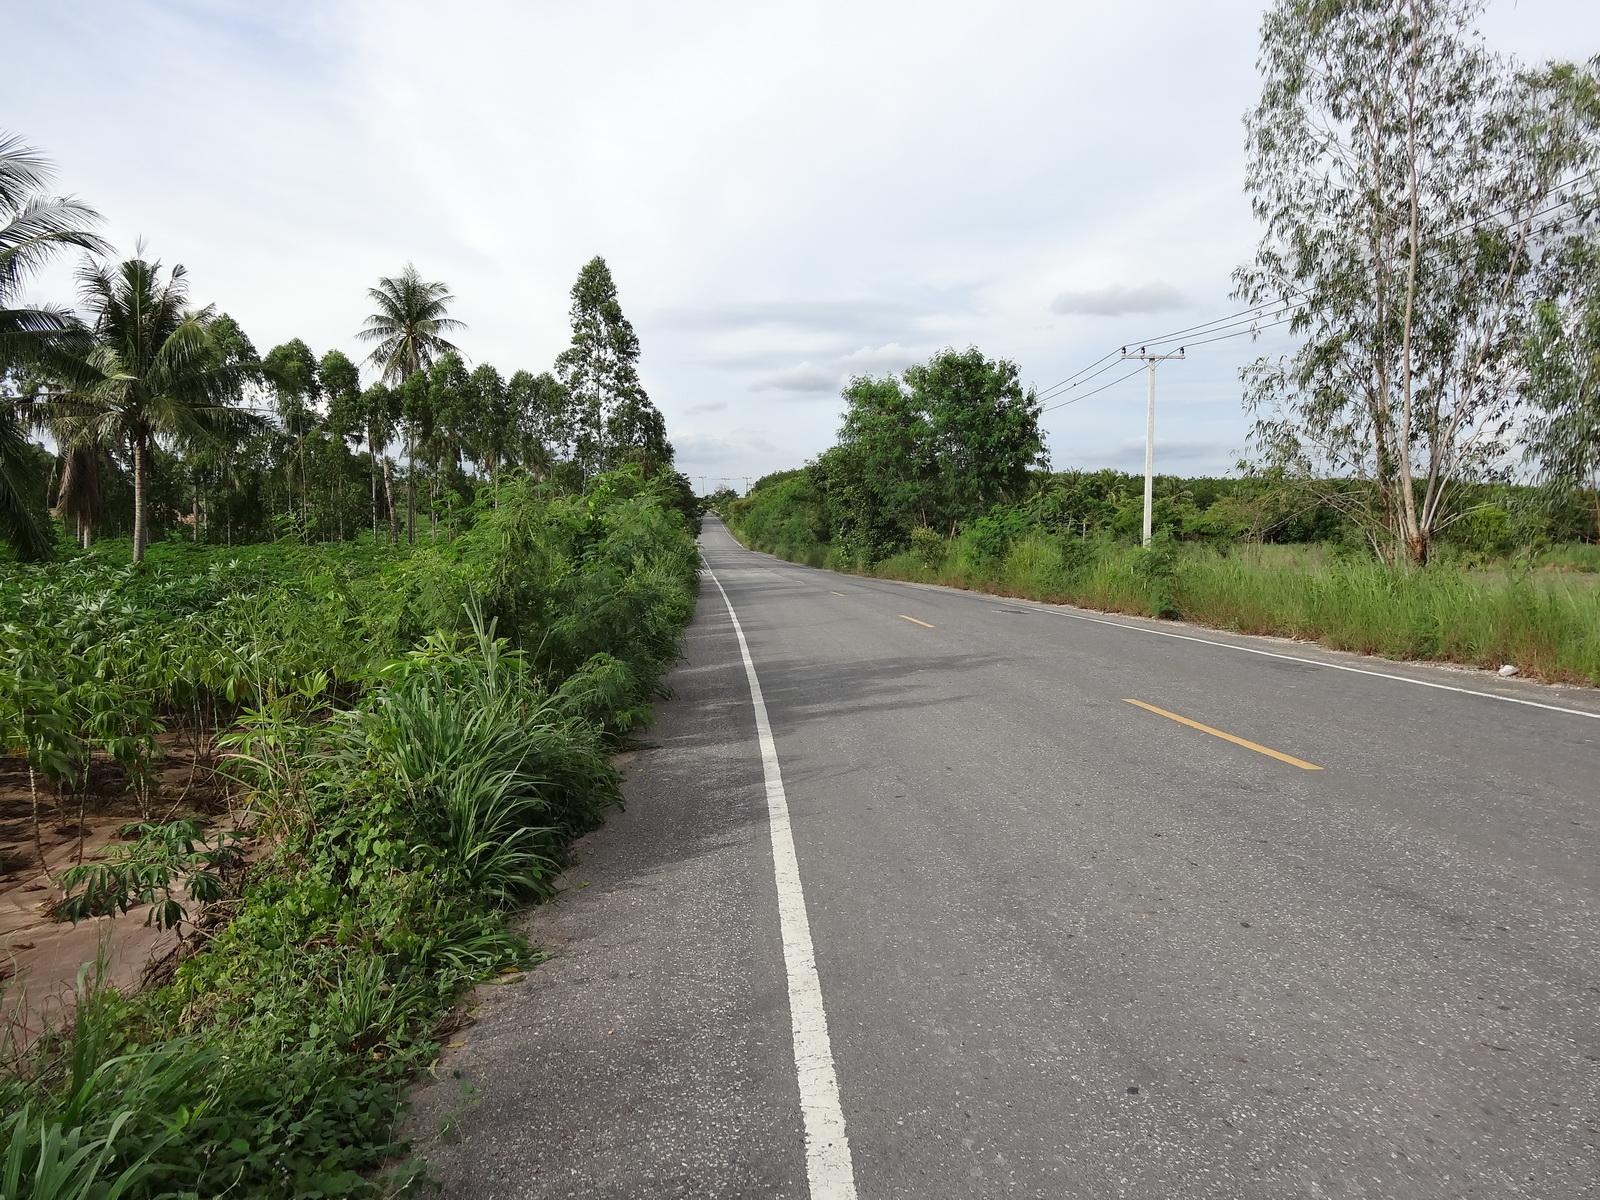 30 Pattaya 235